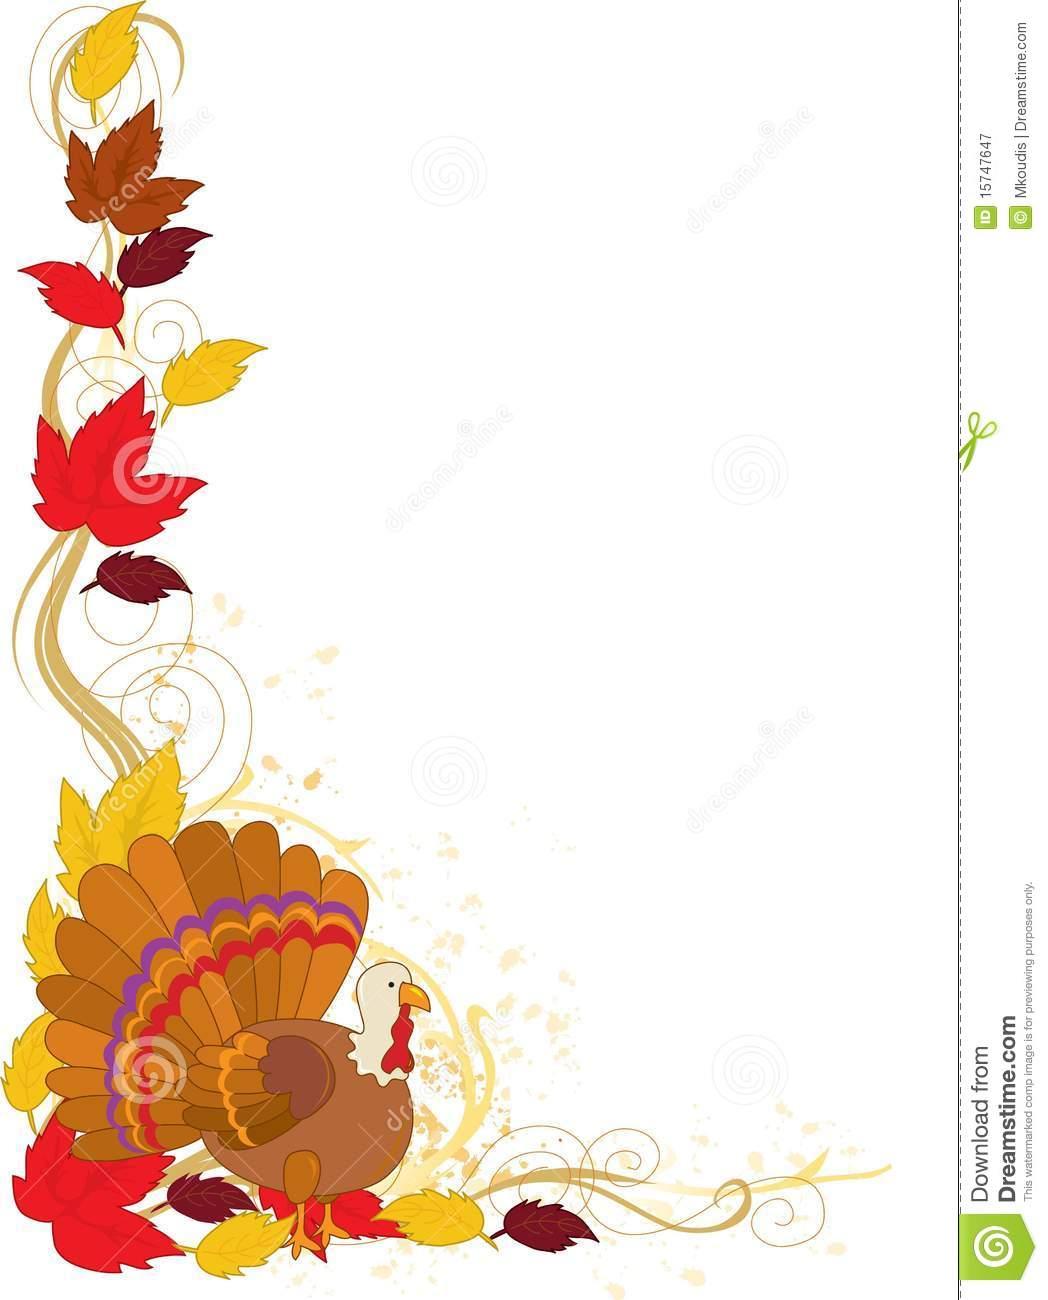 Autumn clipart corner. Turkey border clip art